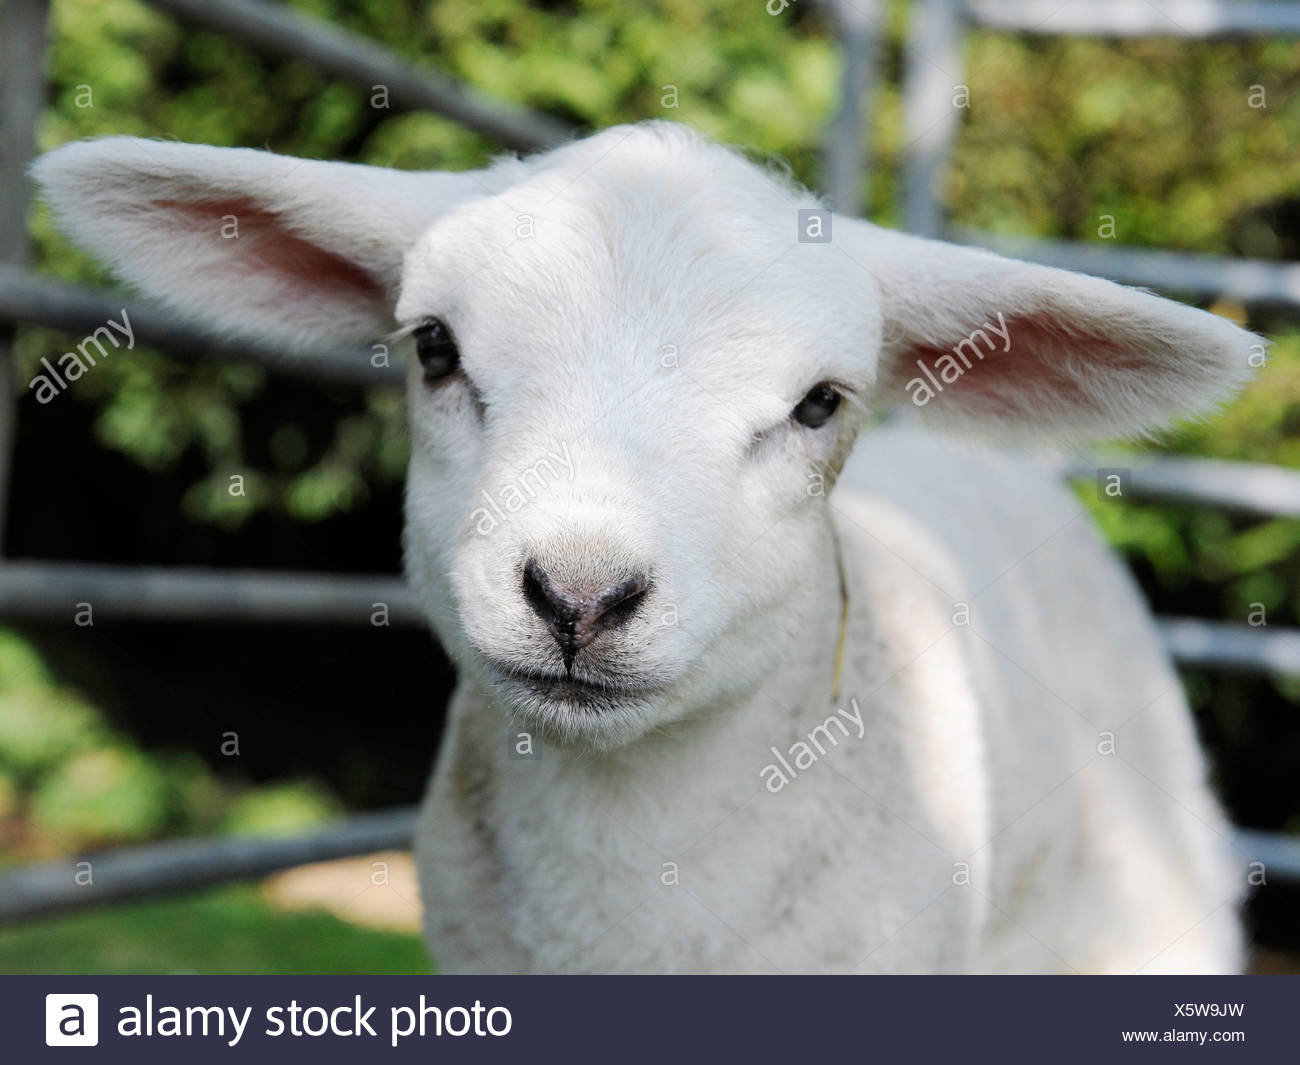 Cute little white lamb. - Stock Image